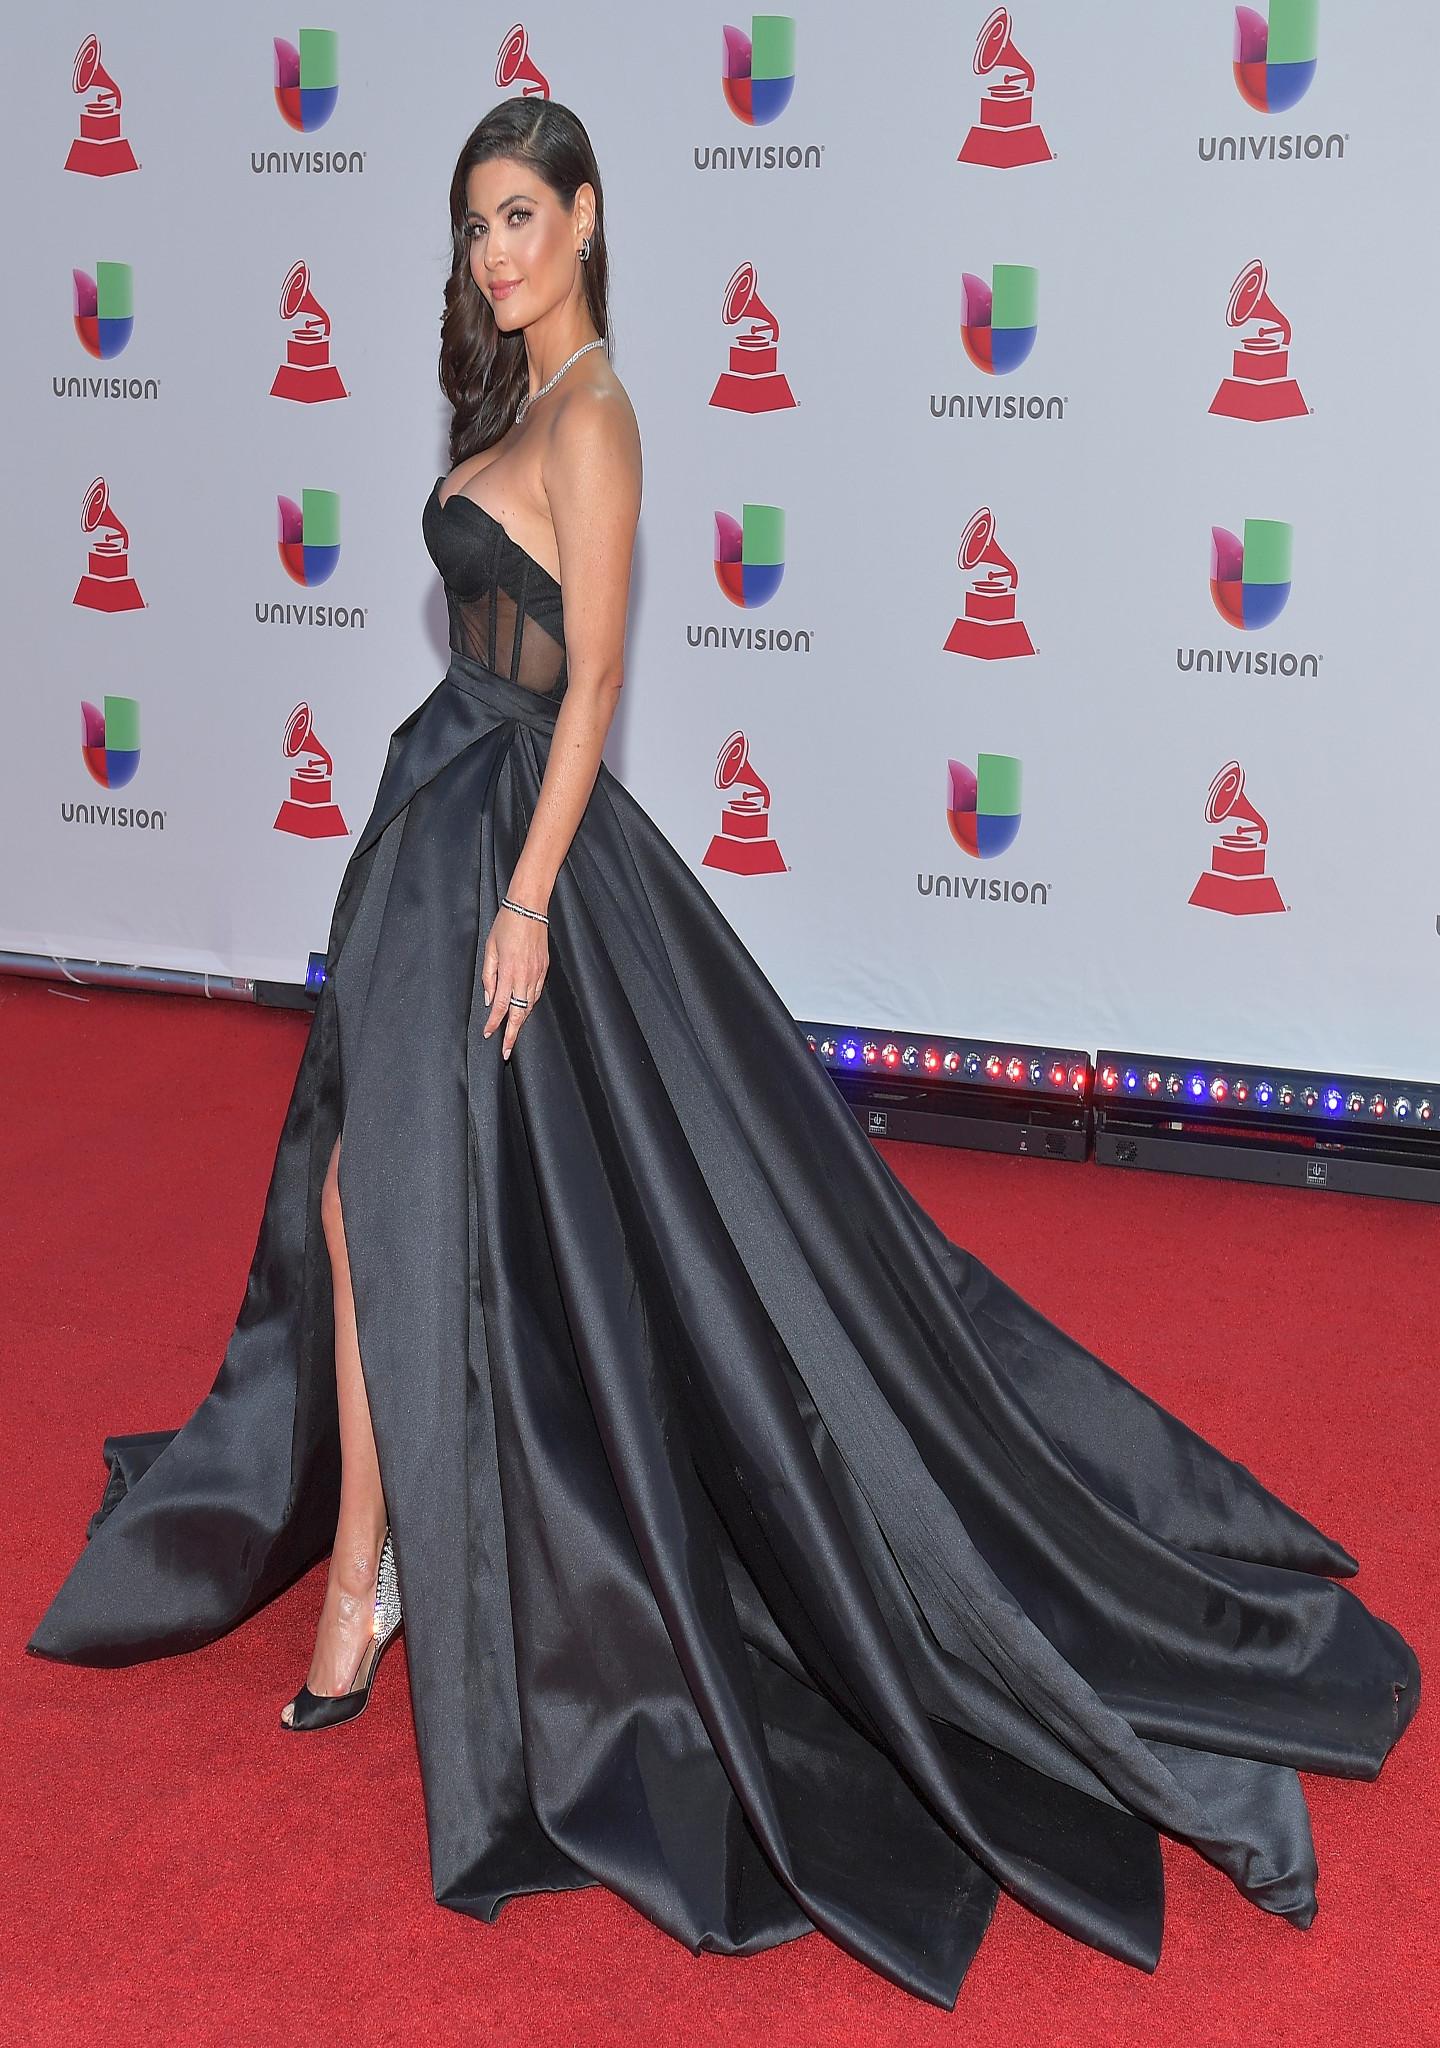 Chiquinquira Delgado